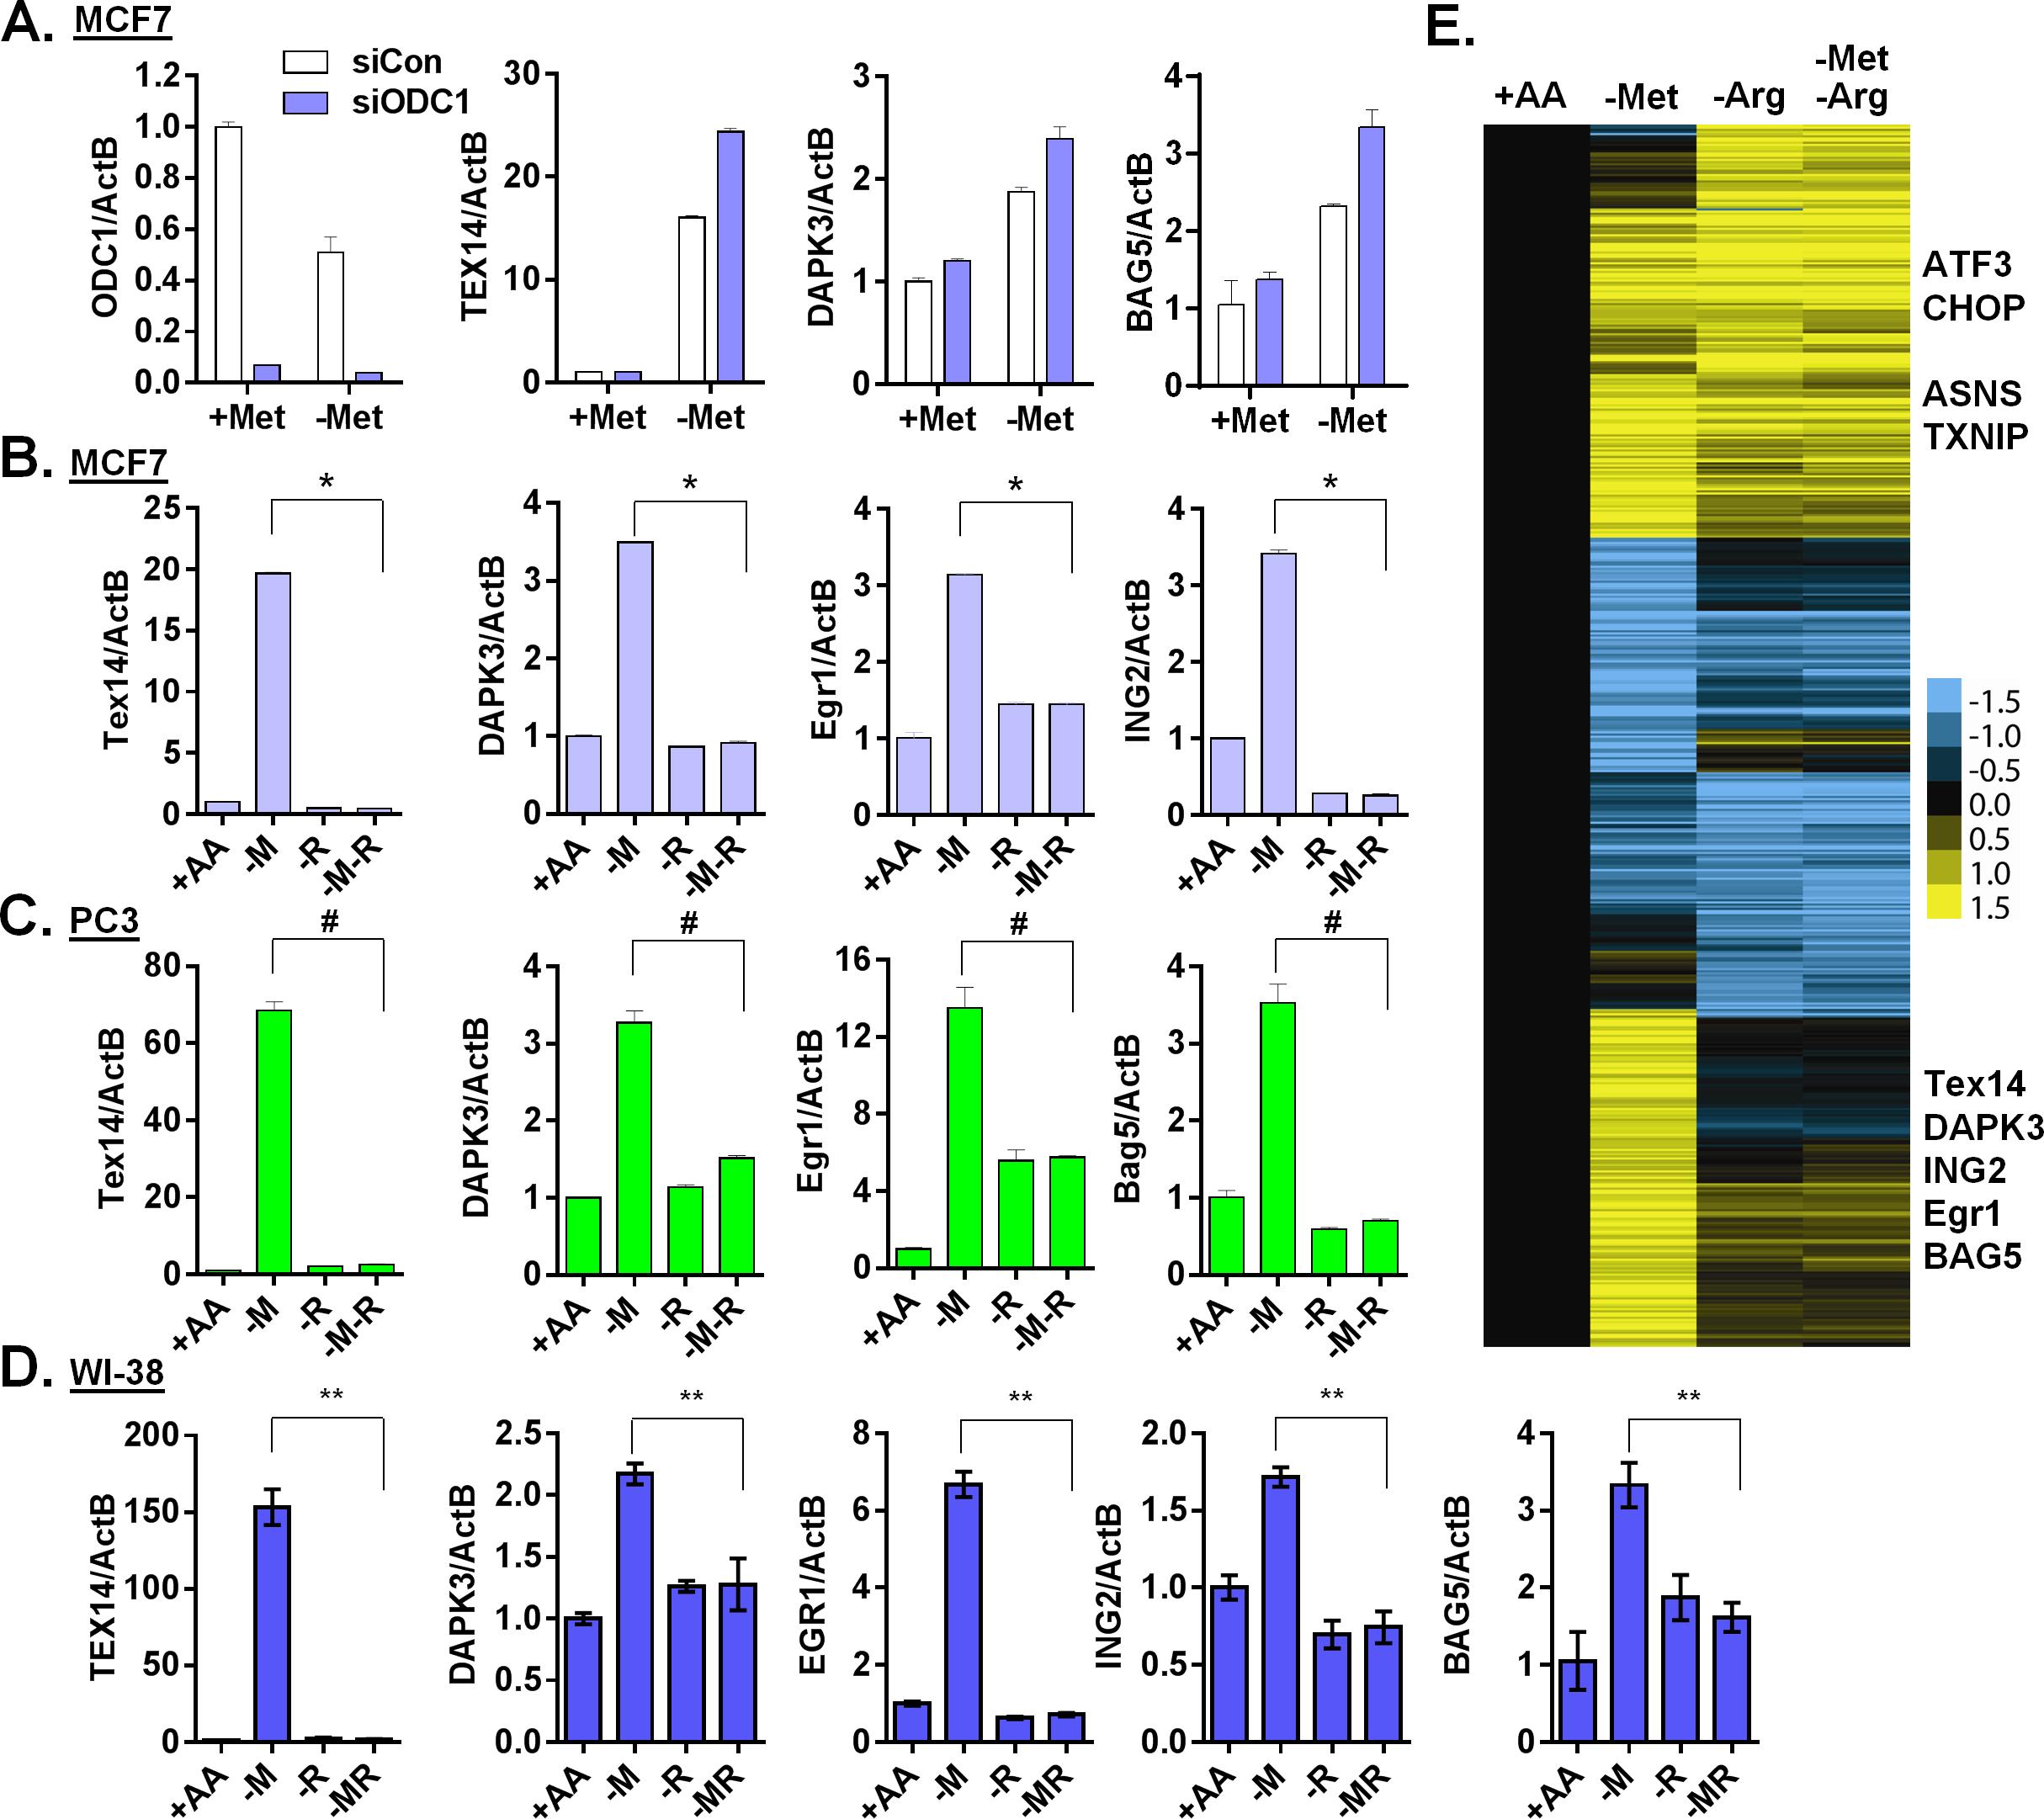 Arginine is required for the methionine-specific transcriptional response.